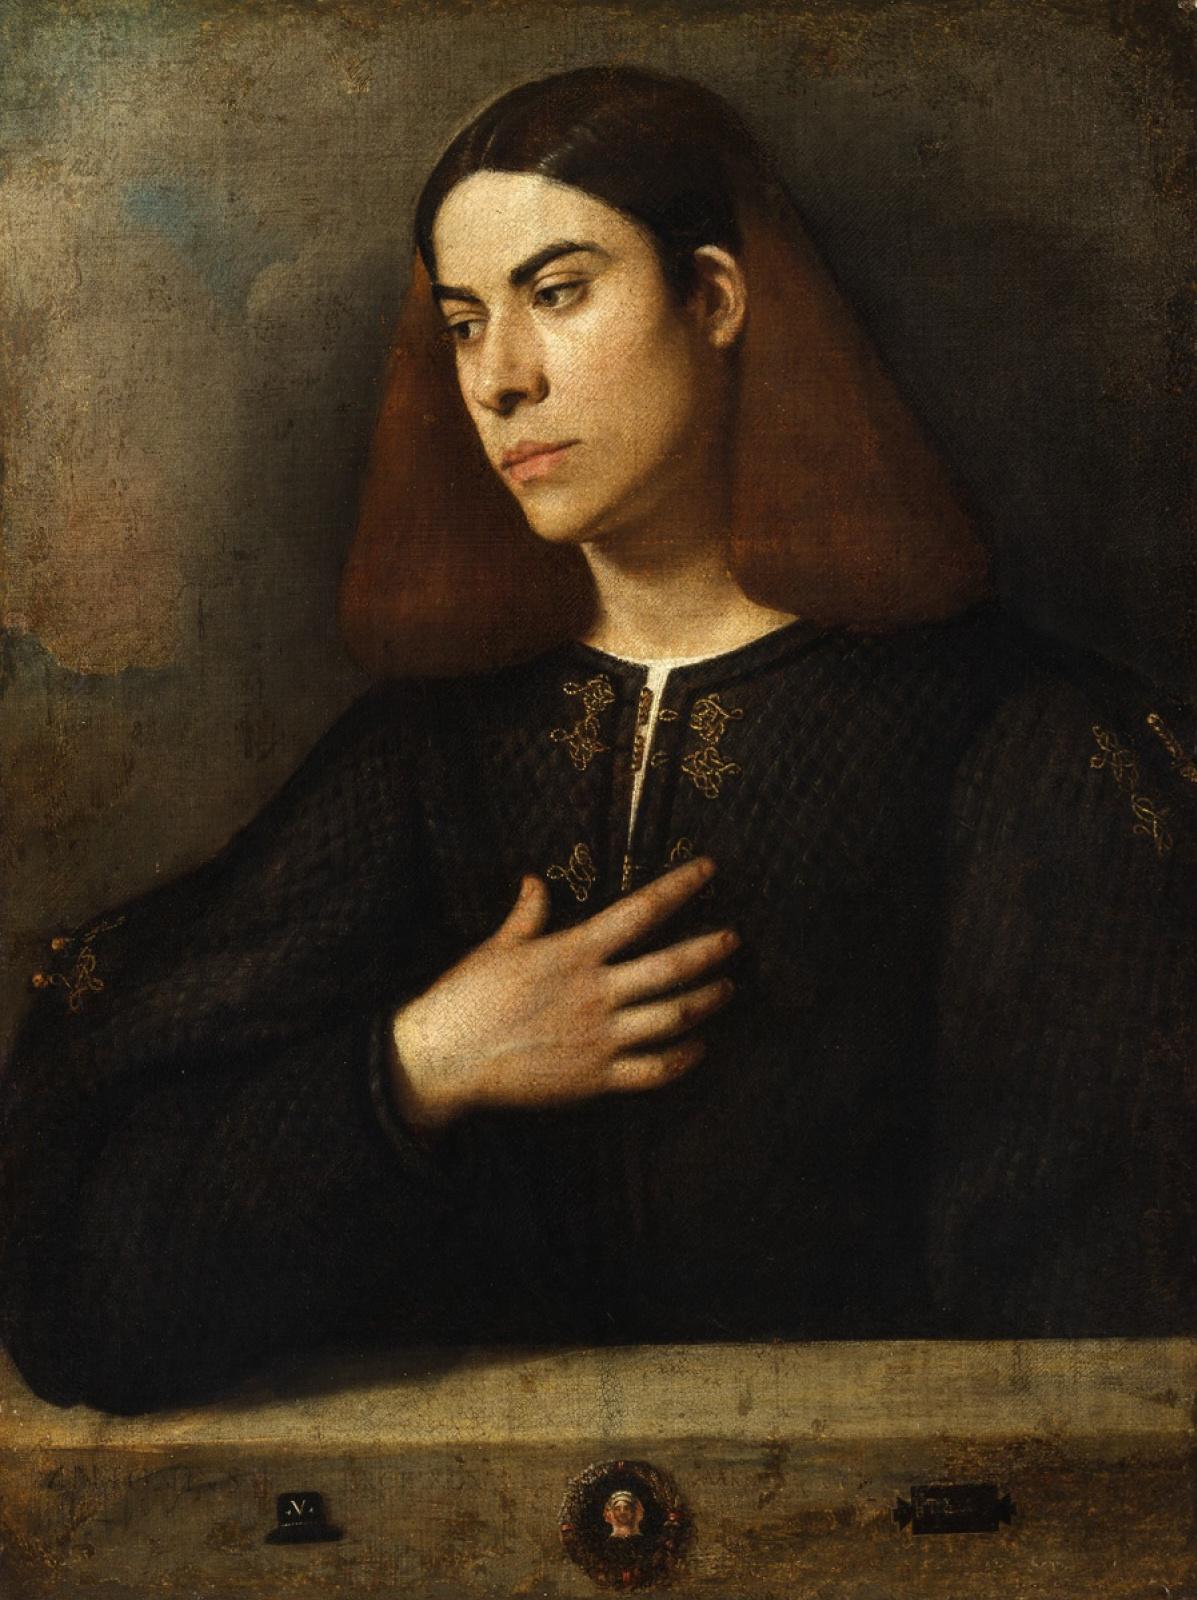 Джорджоне. Портрет молодого человека (Антонио Броккардо)